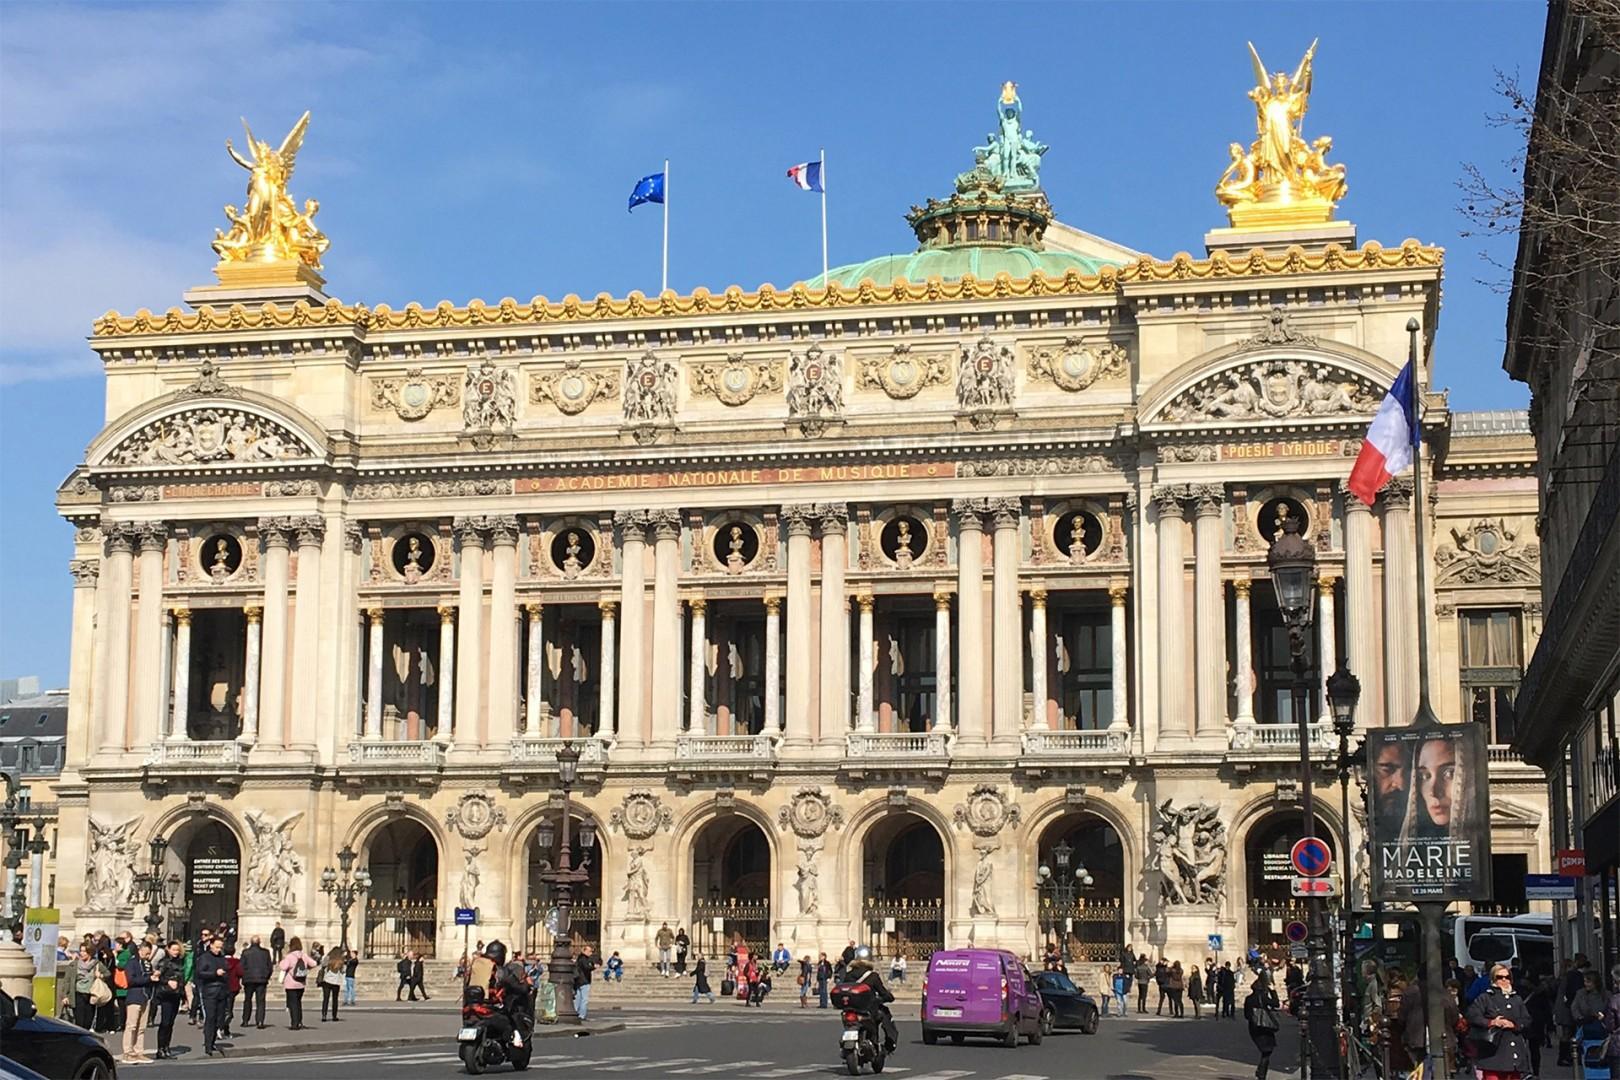 Take a short stroll to the beautiful Opera Garnier.